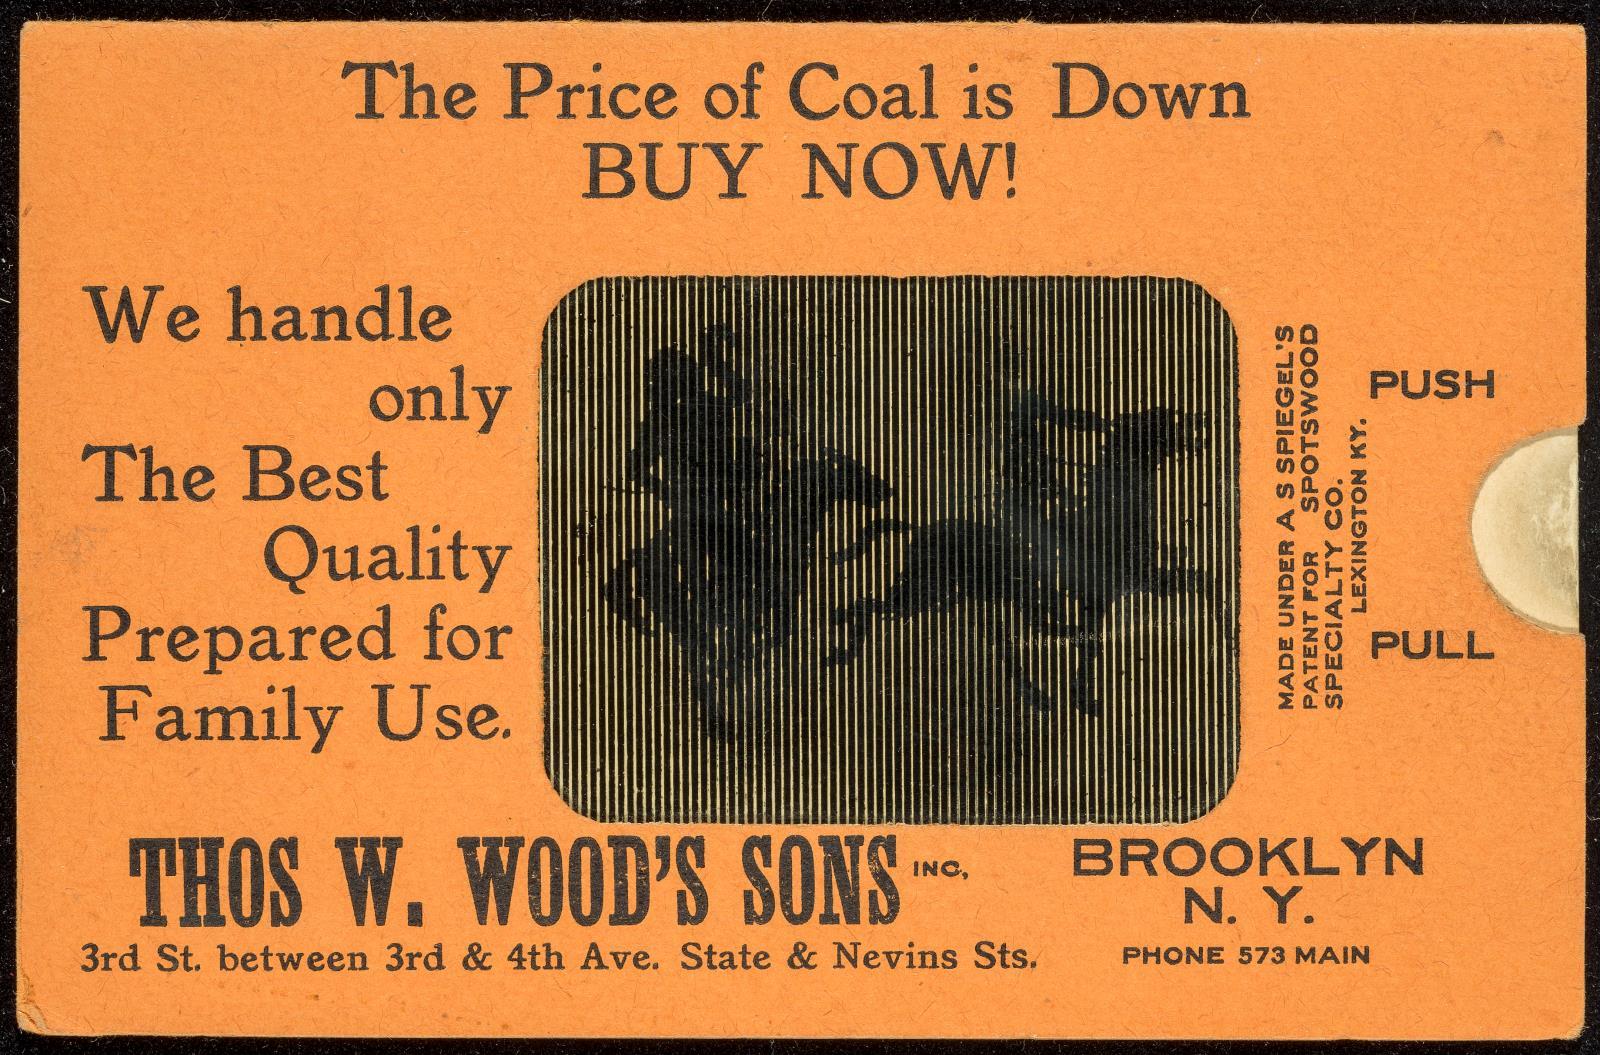 best quality of coal